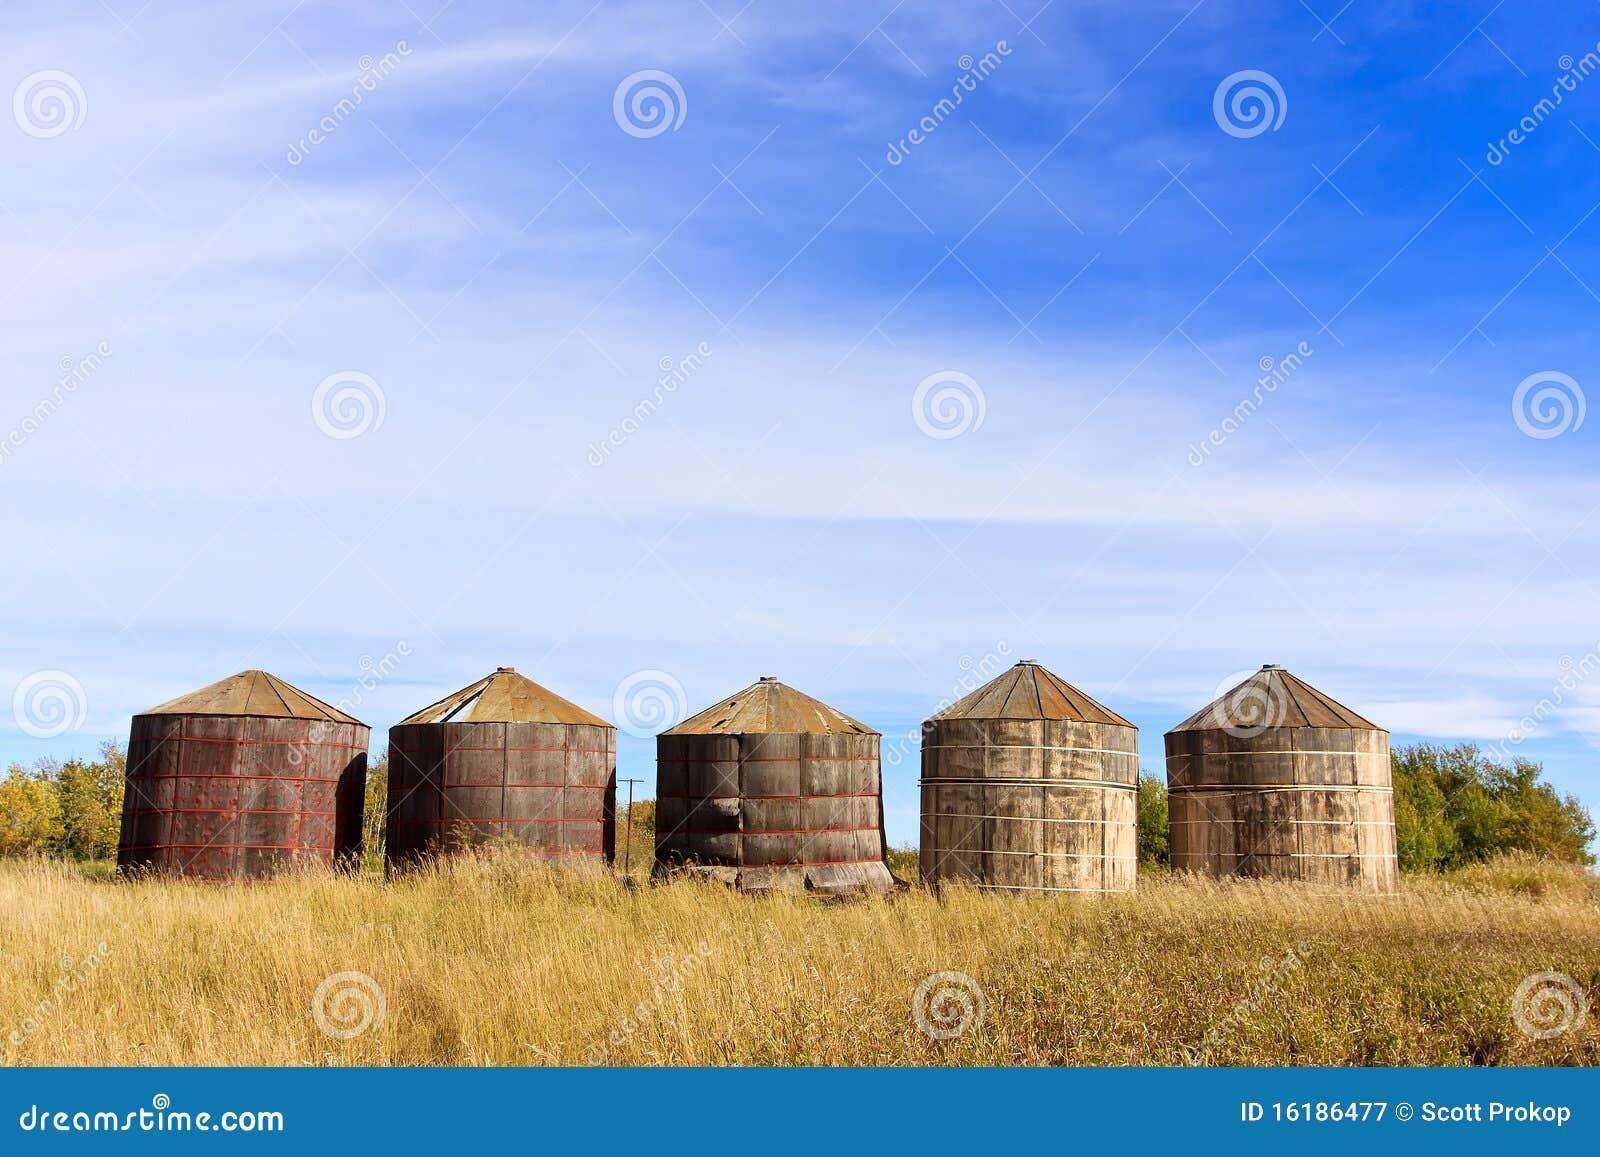 Wood Grain Storage : Wooden grain storage bins stock image of wheat